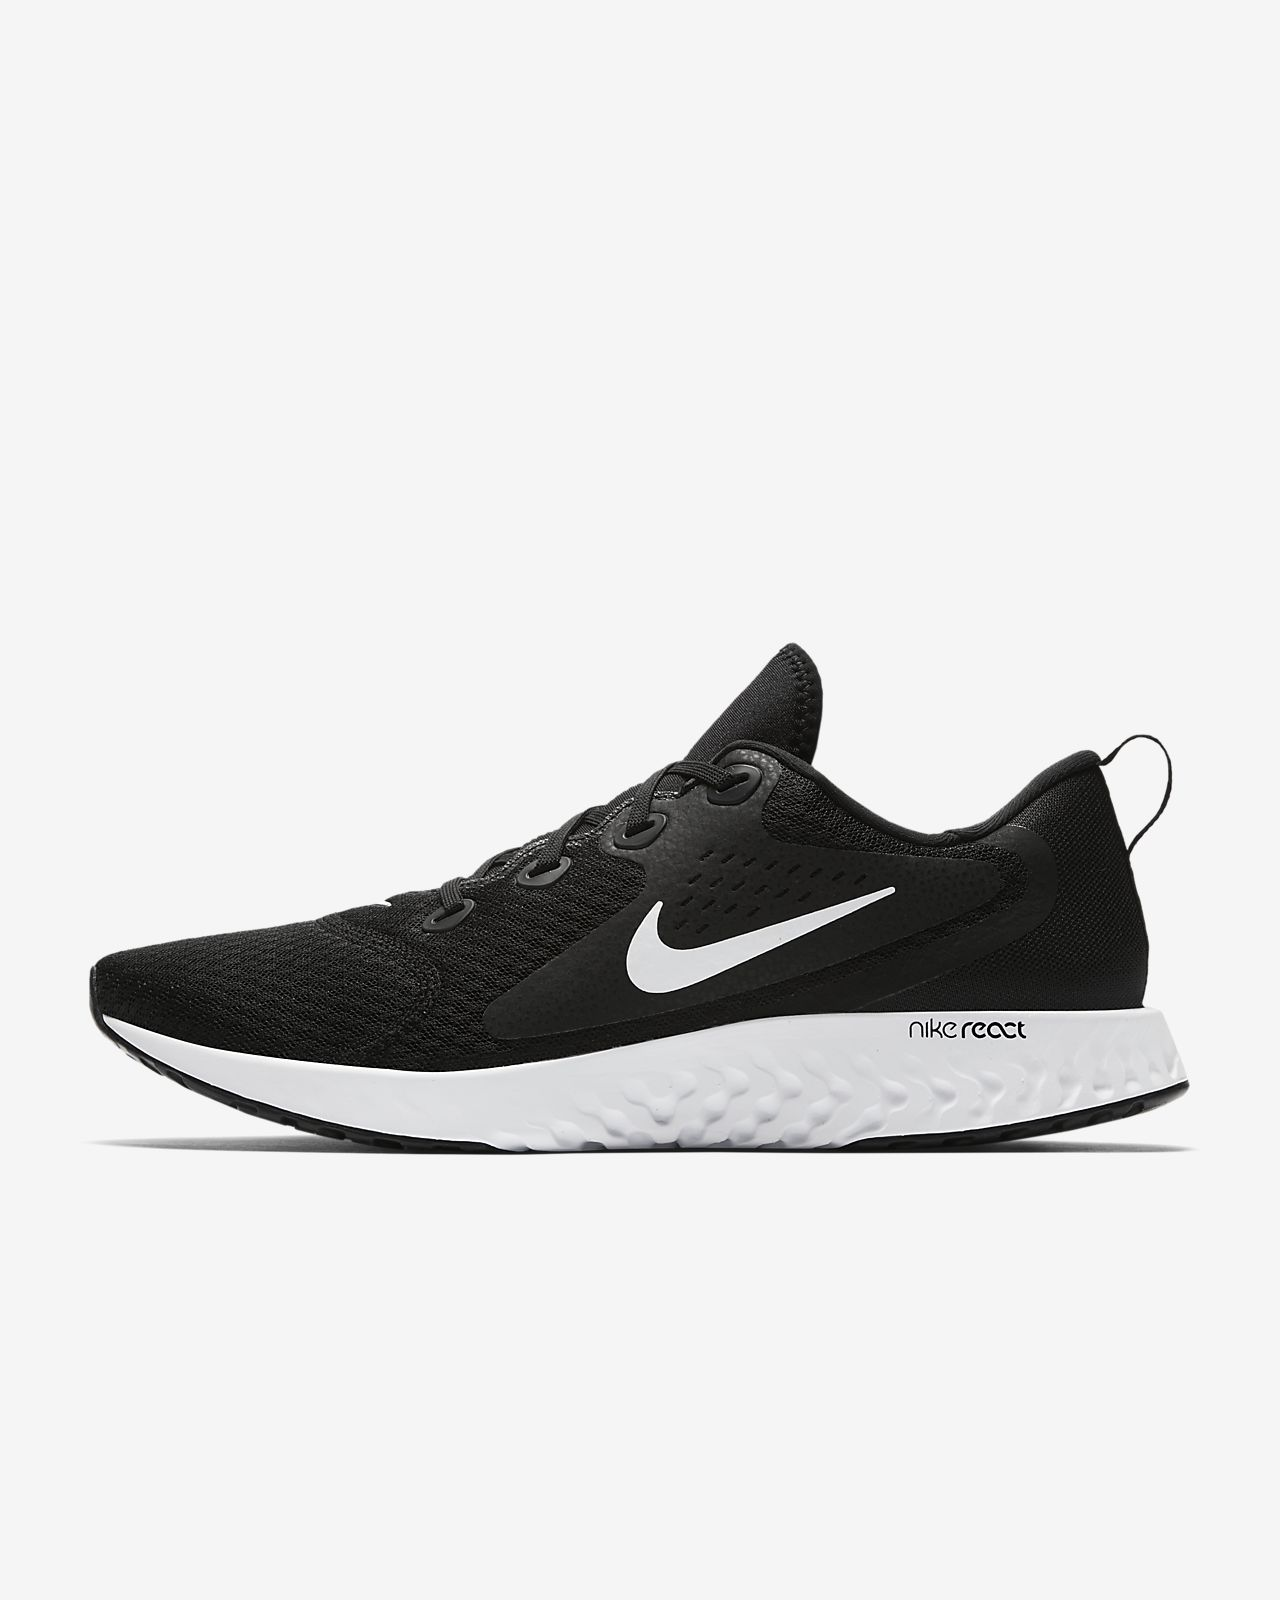 e5a034f6cb2ae9 Nike Legend React Herren-Laufschuh. Nike.com DE